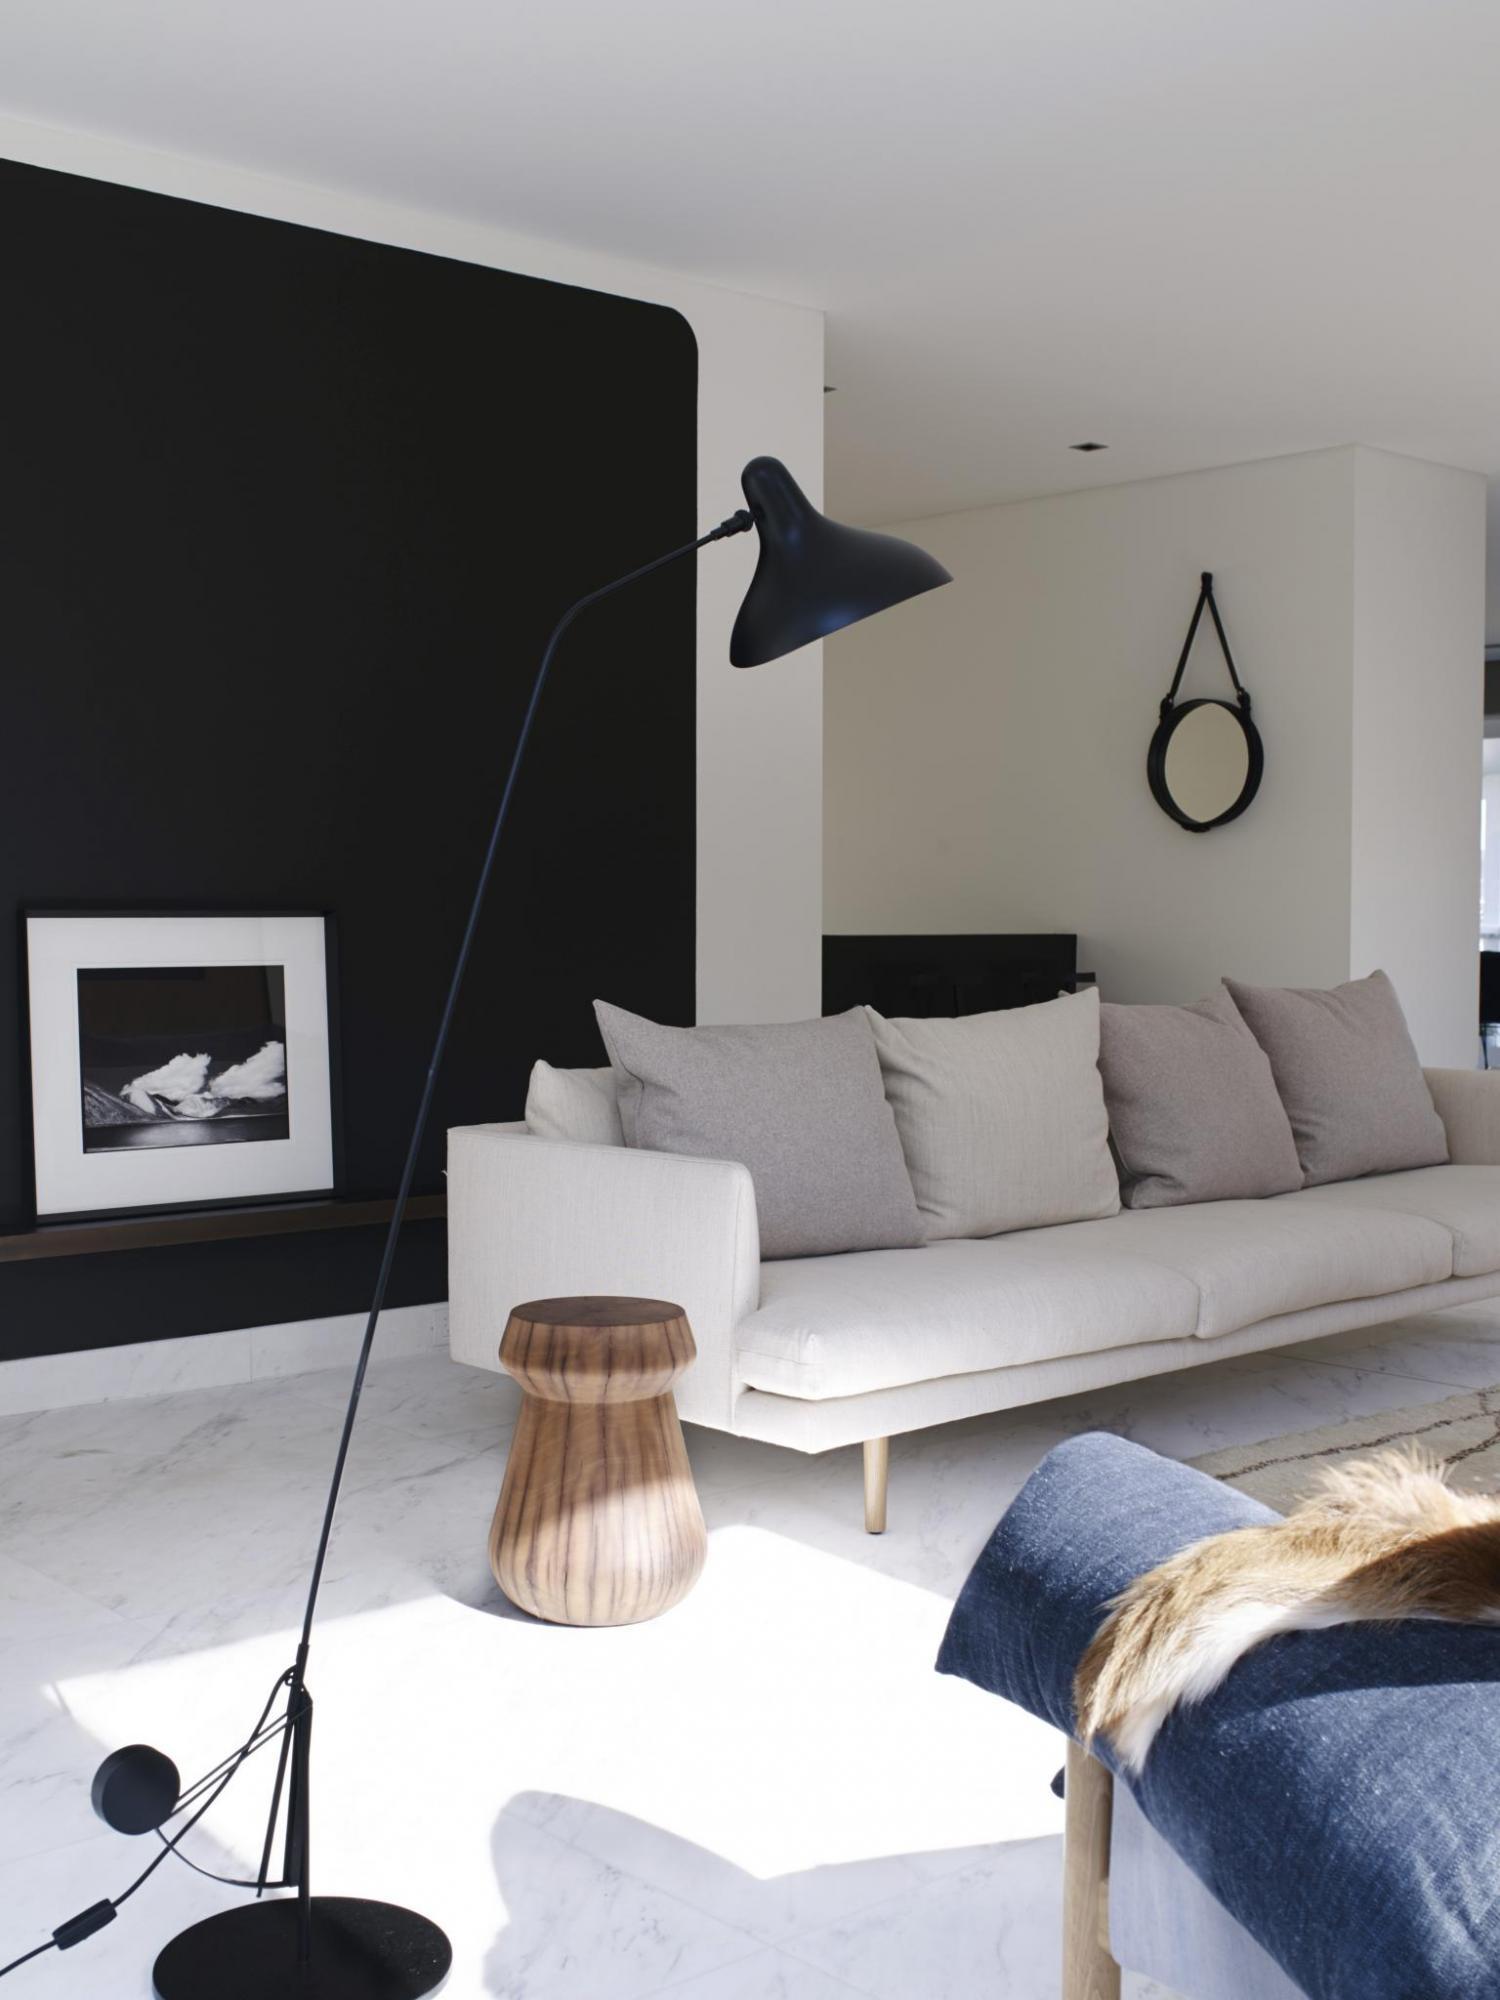 Cronulla Residence By Amber Road   Interior Design   Sydney, NSW, Australia    Australian